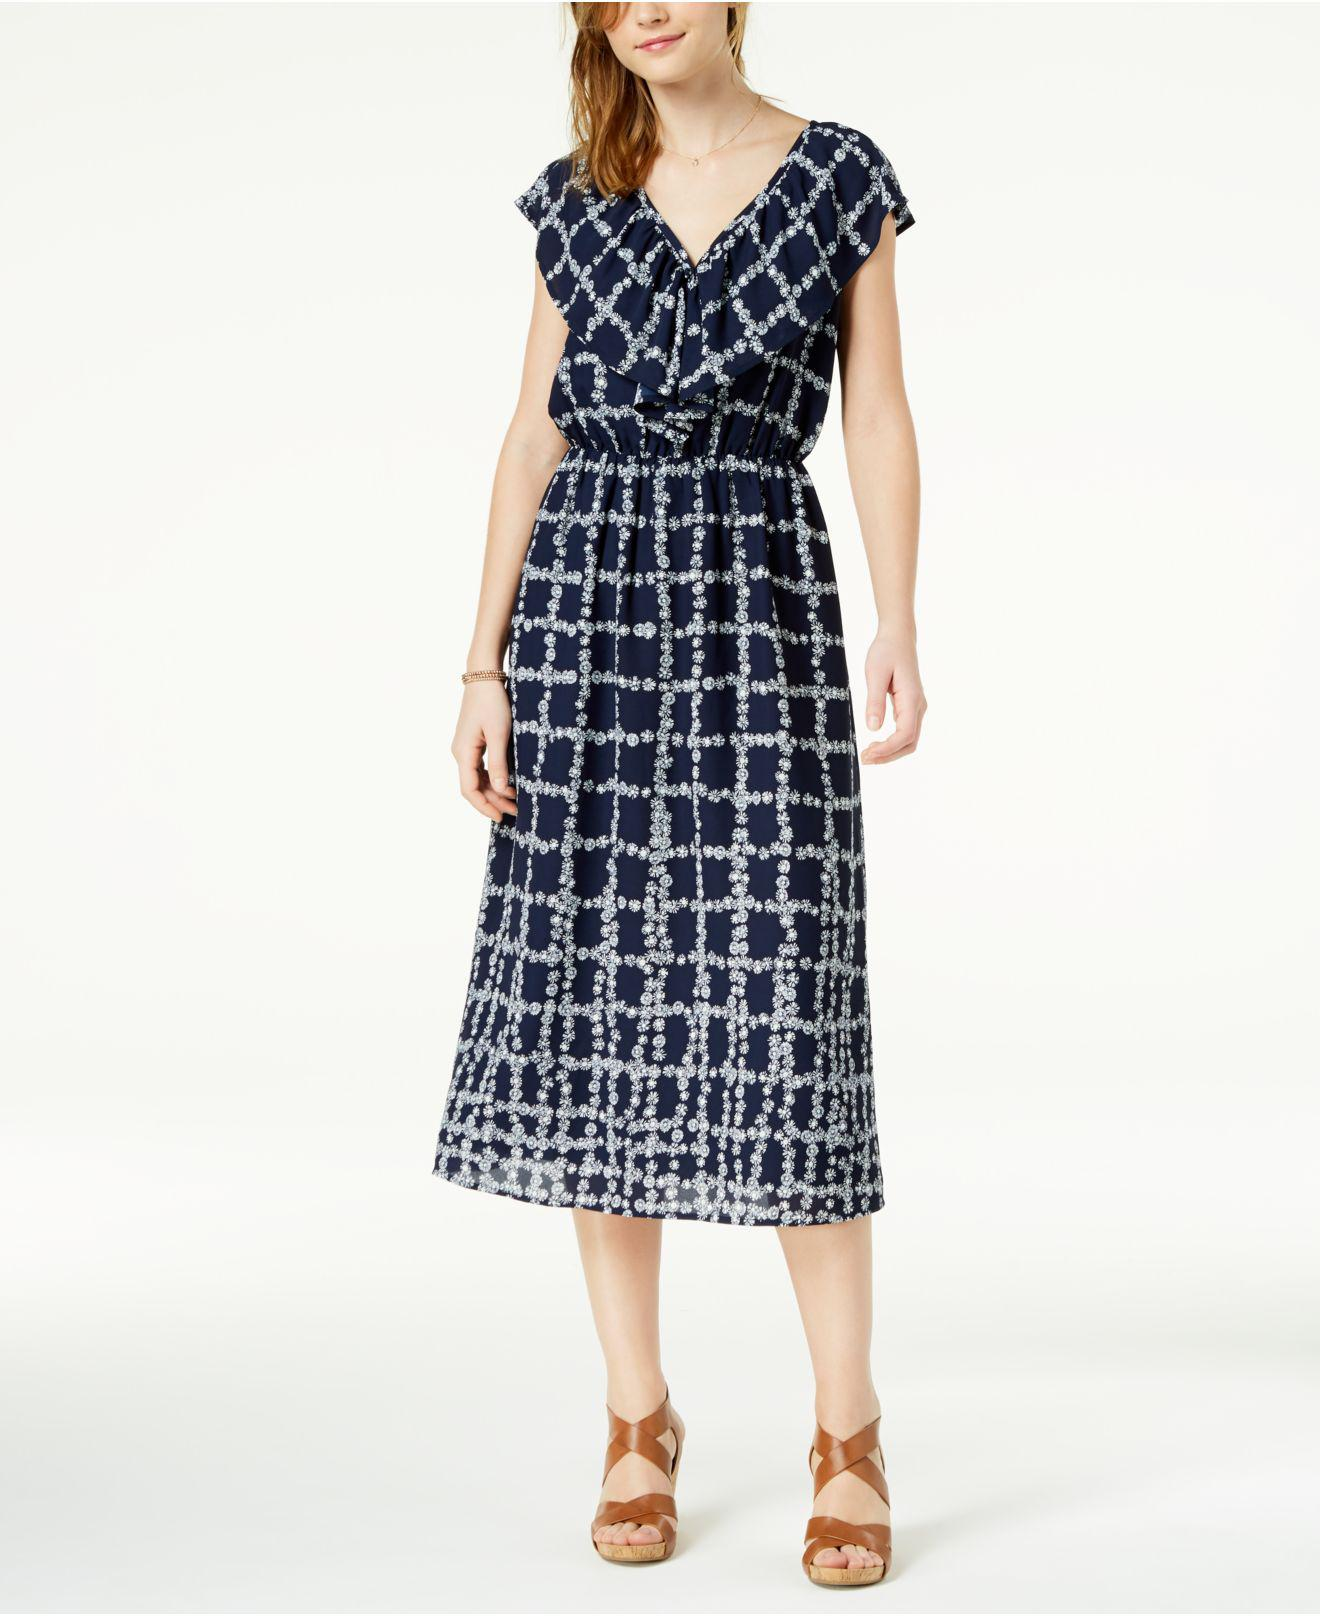 1cfb942e0313 Lyst - Maison Jules Printed Flounce Maxi Dress